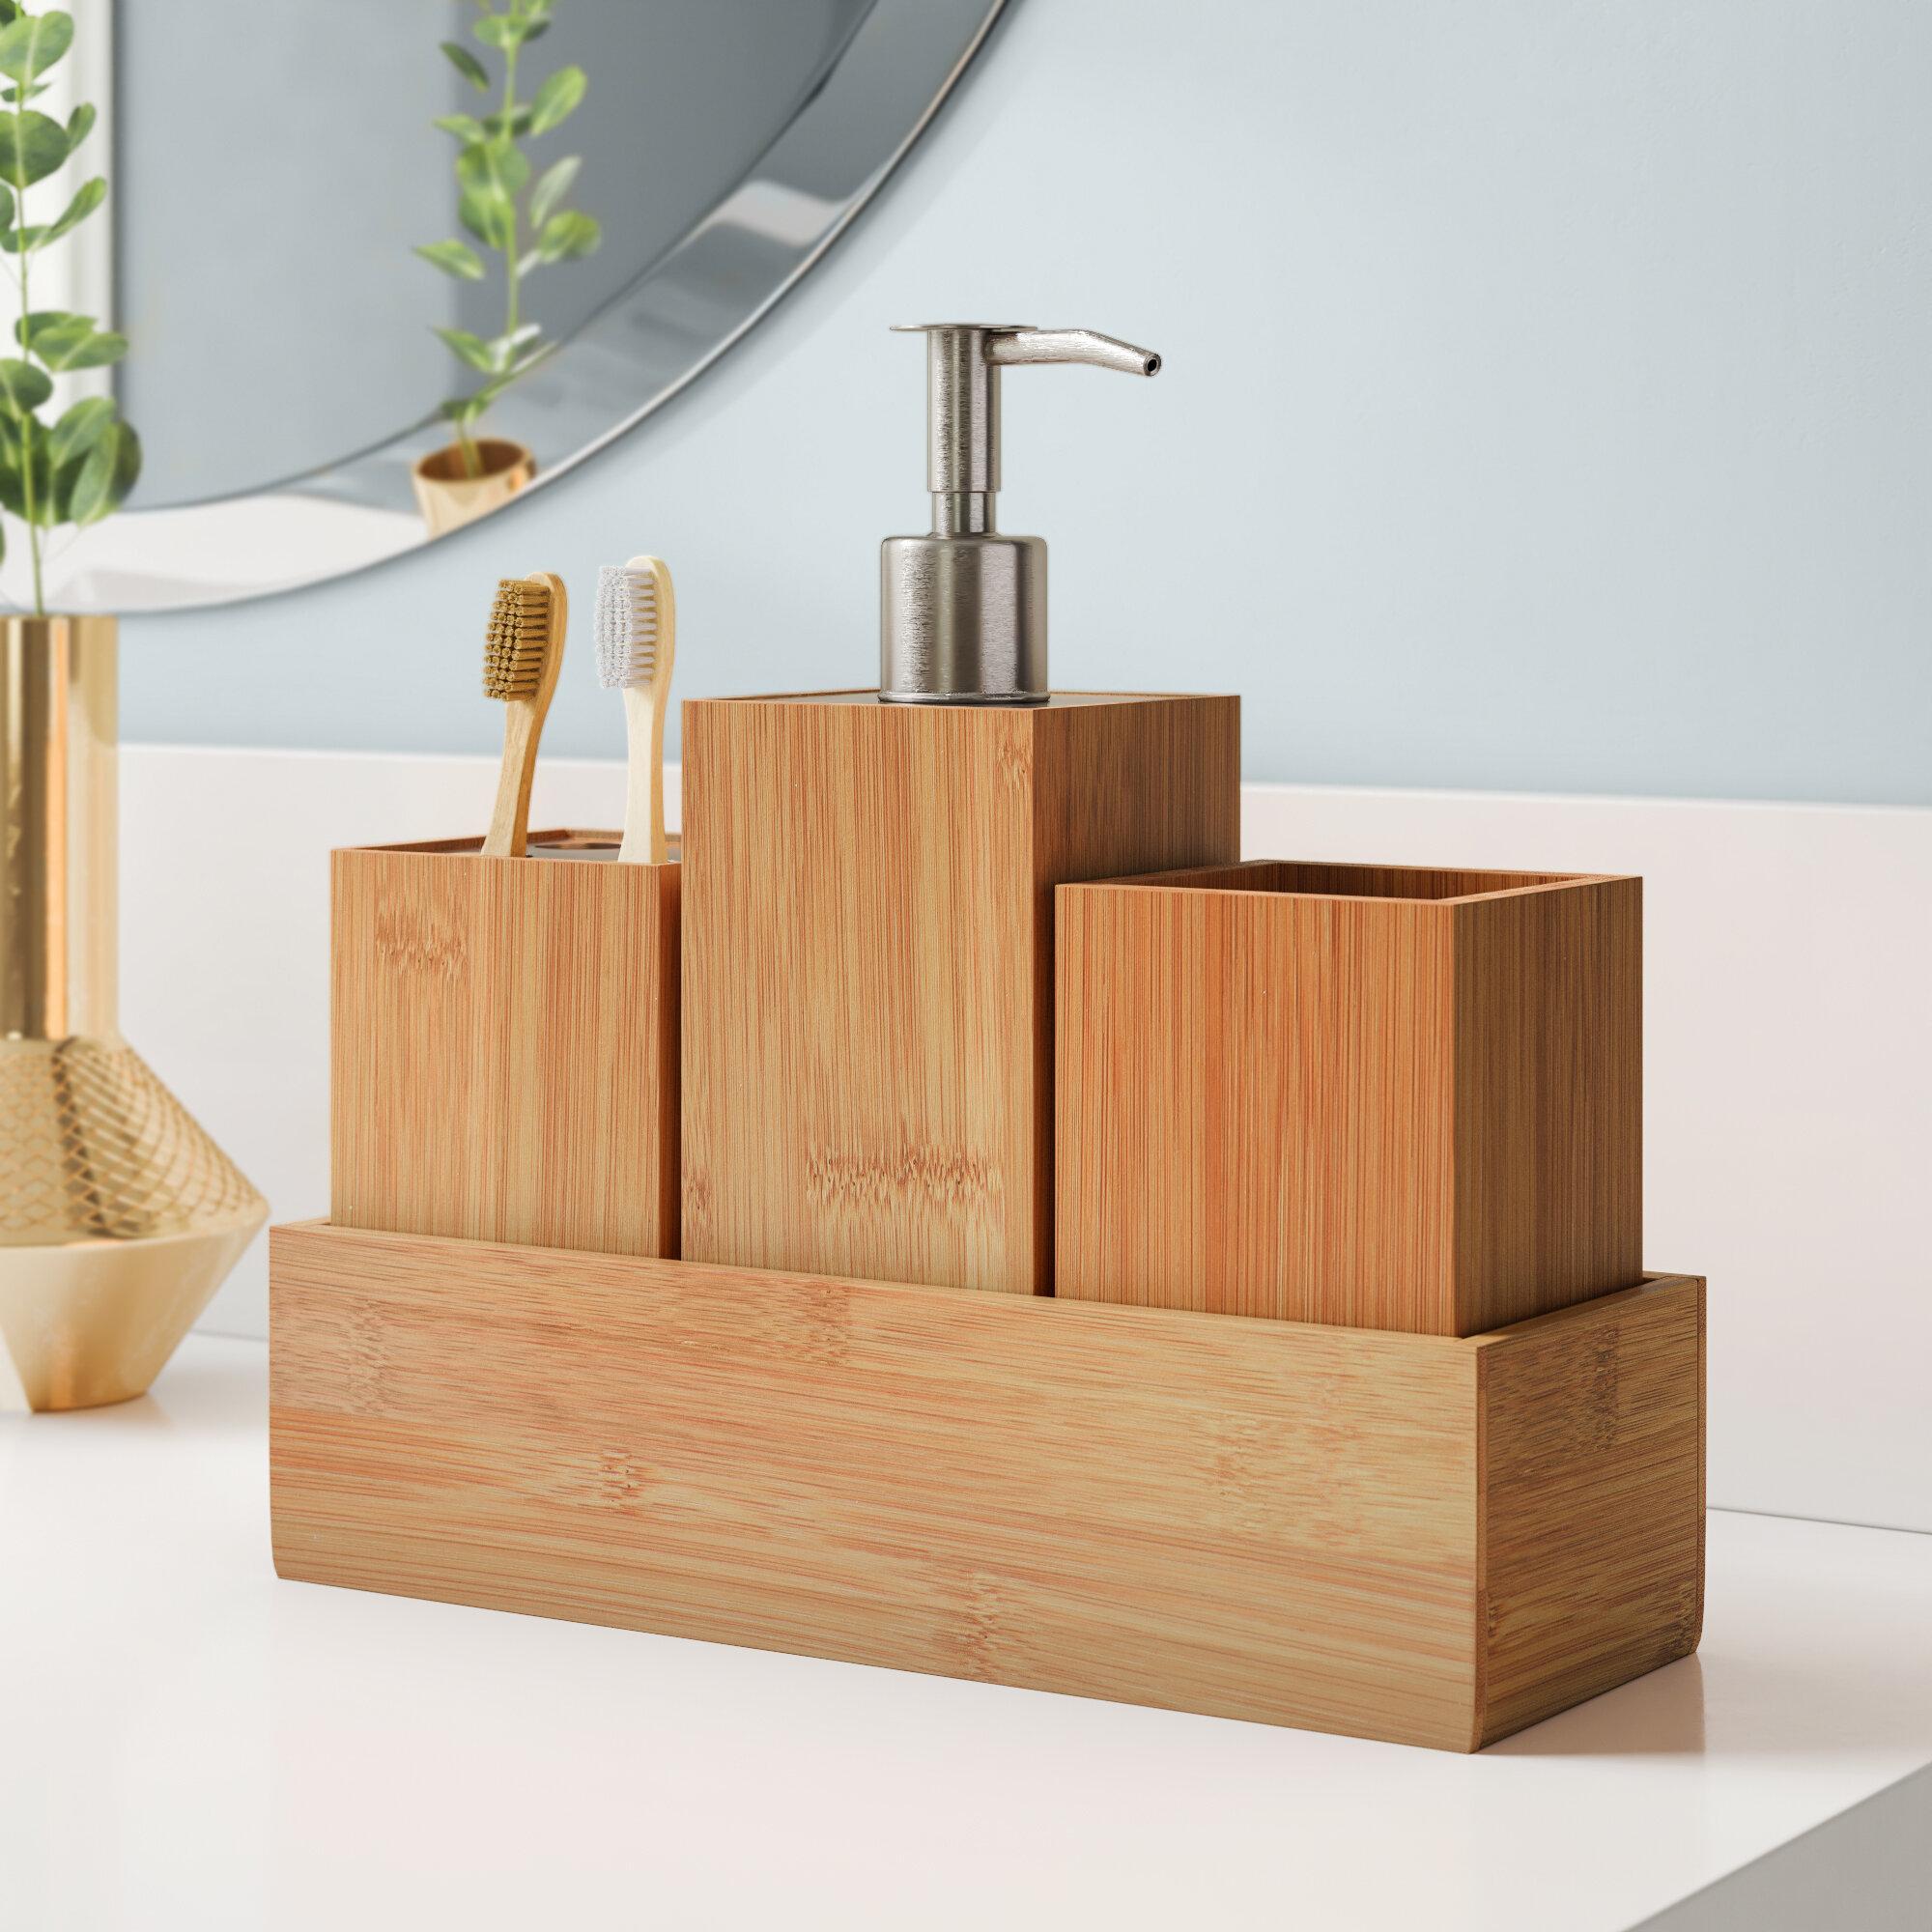 Highland Dunes Mcrae Bamboo 4 Piece Bathroom Accessory Set Reviews Wayfair